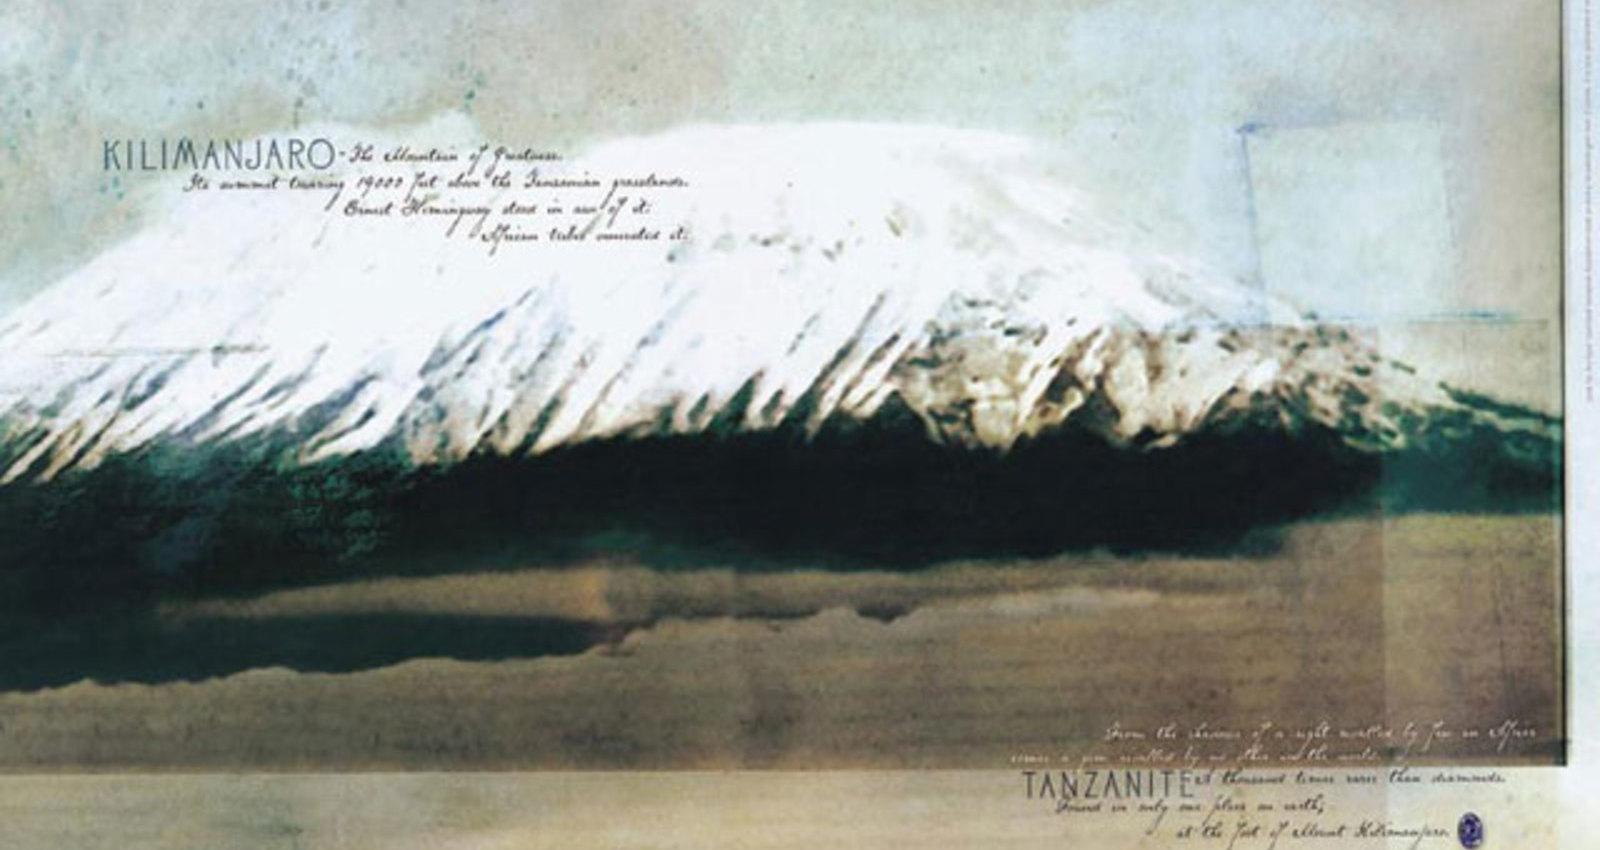 Kilimanjaro, Warrior, Lightning